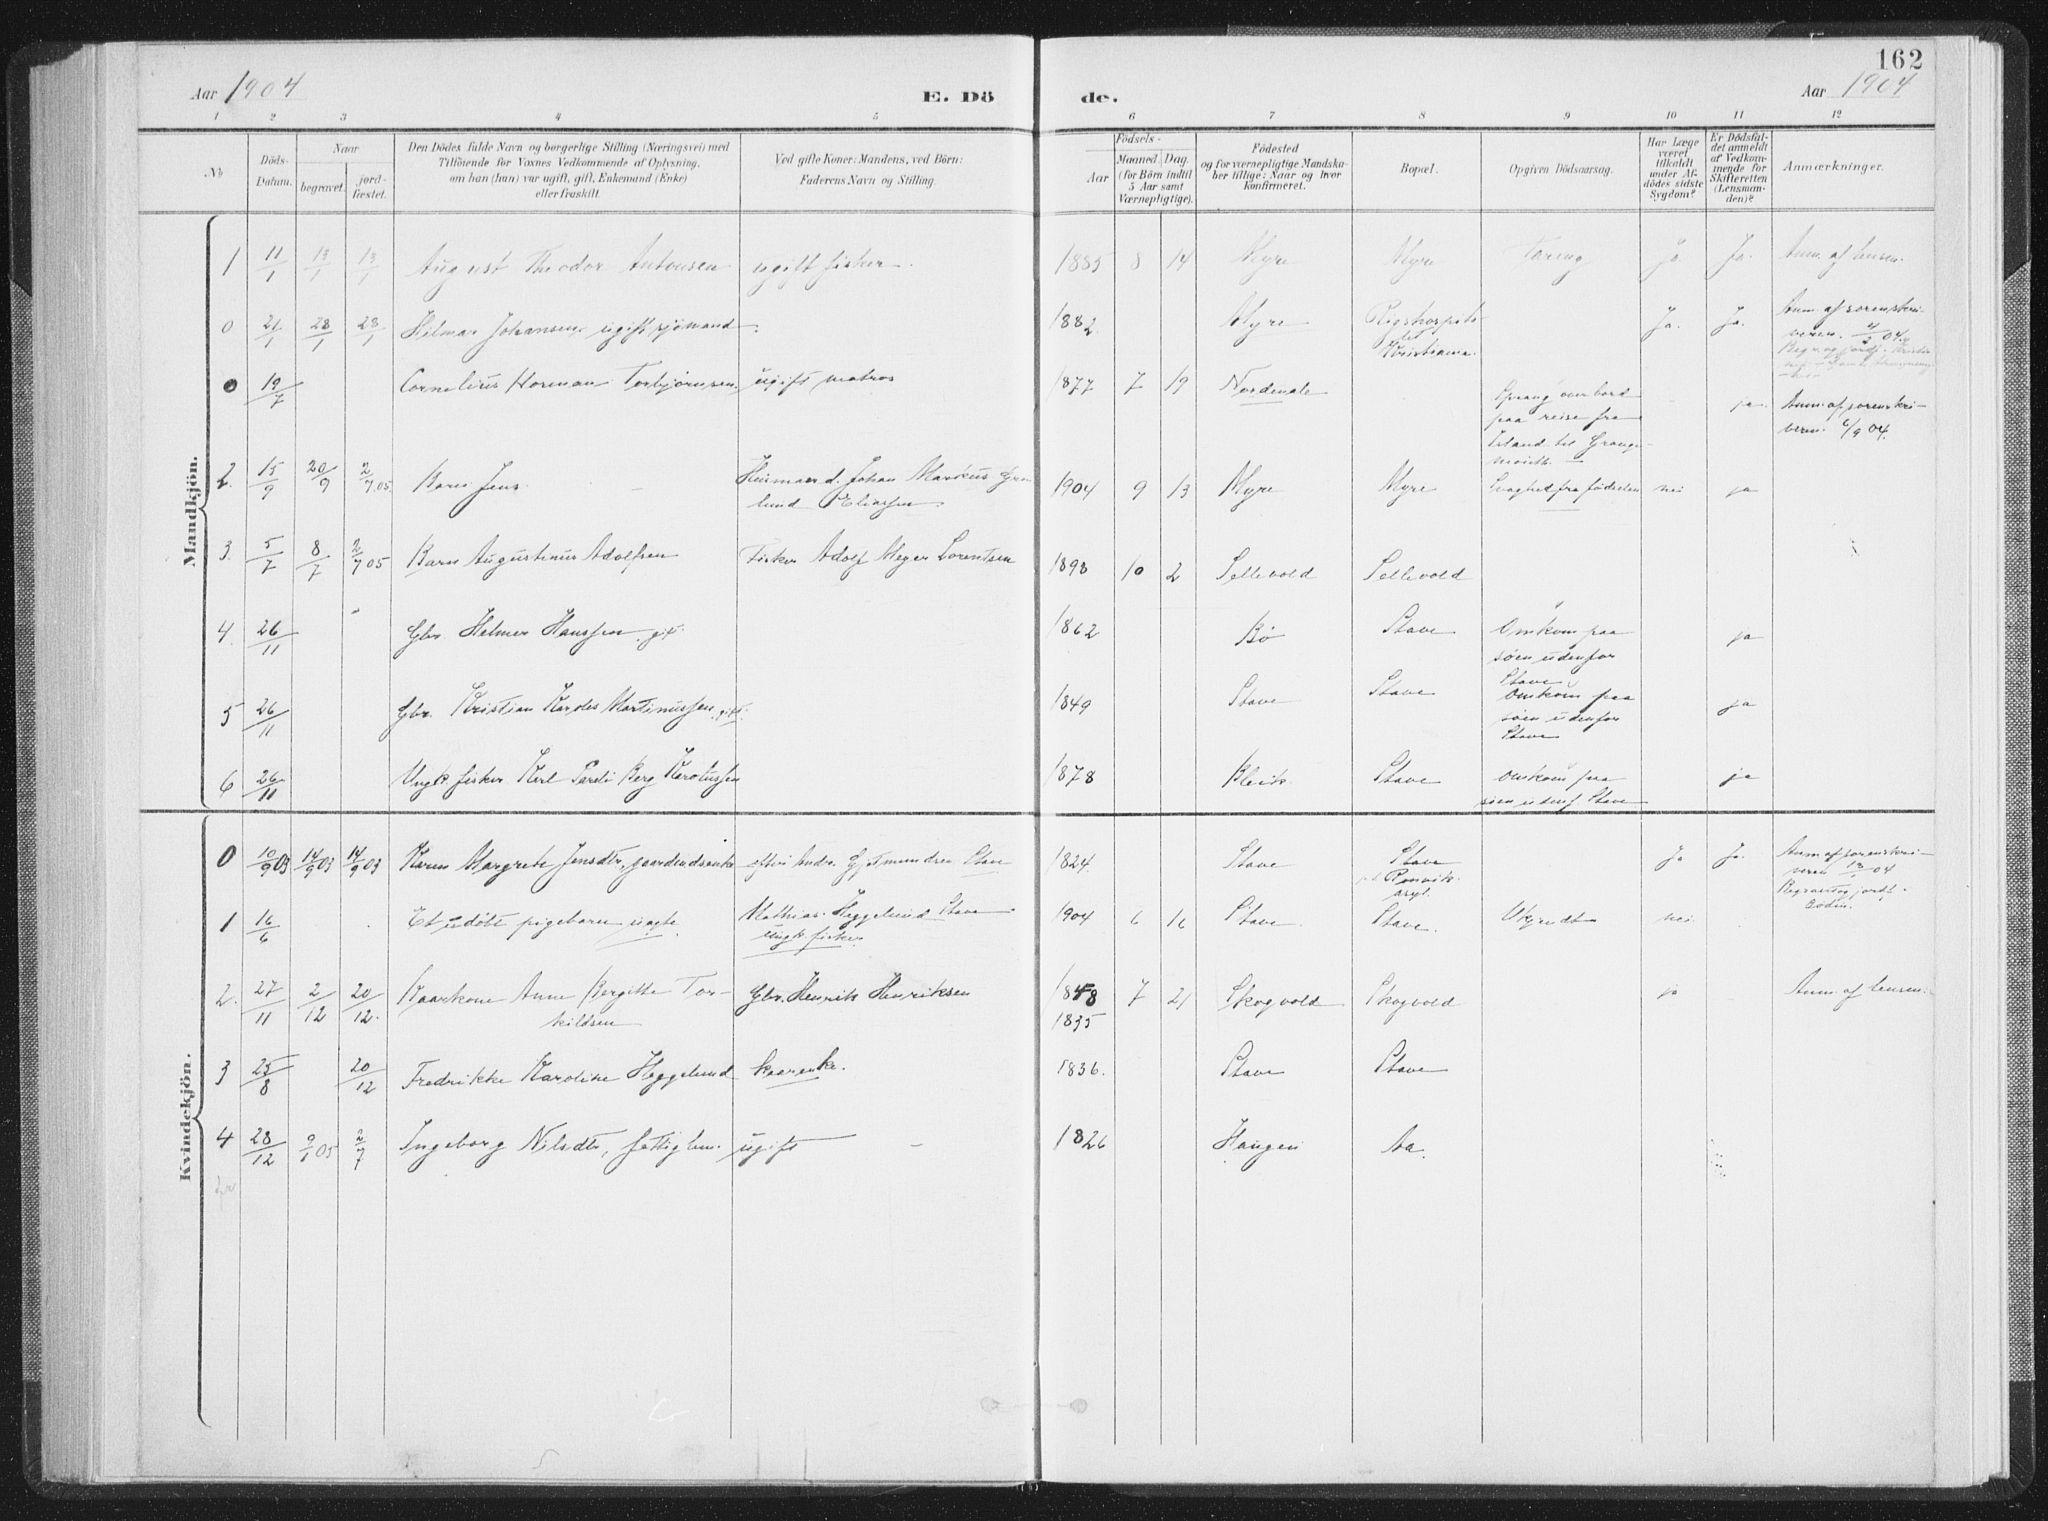 SAT, Ministerialprotokoller, klokkerbøker og fødselsregistre - Nordland, 897/L1400: Ministerialbok nr. 897A07, 1897-1908, s. 162